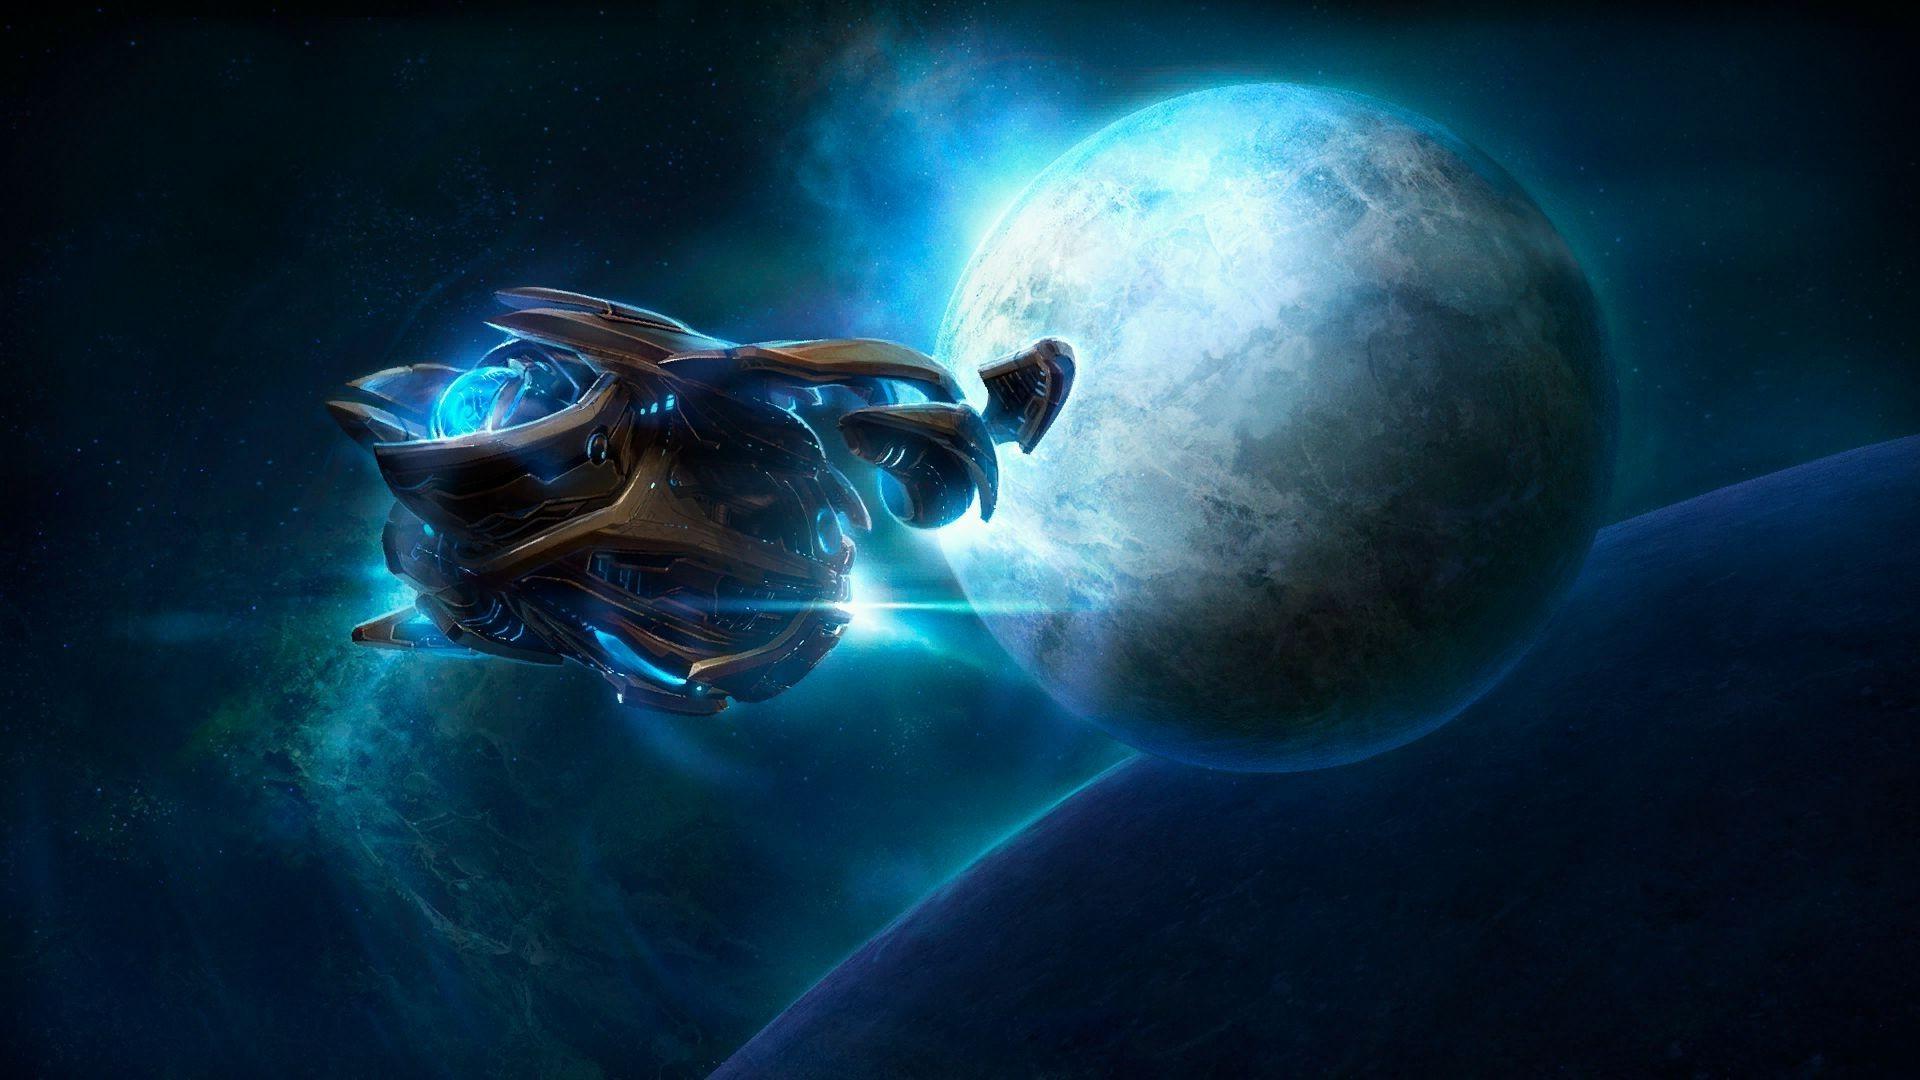 download StarCraft Starcraft II Protoss Wallpapers HD Desktop 1920x1080